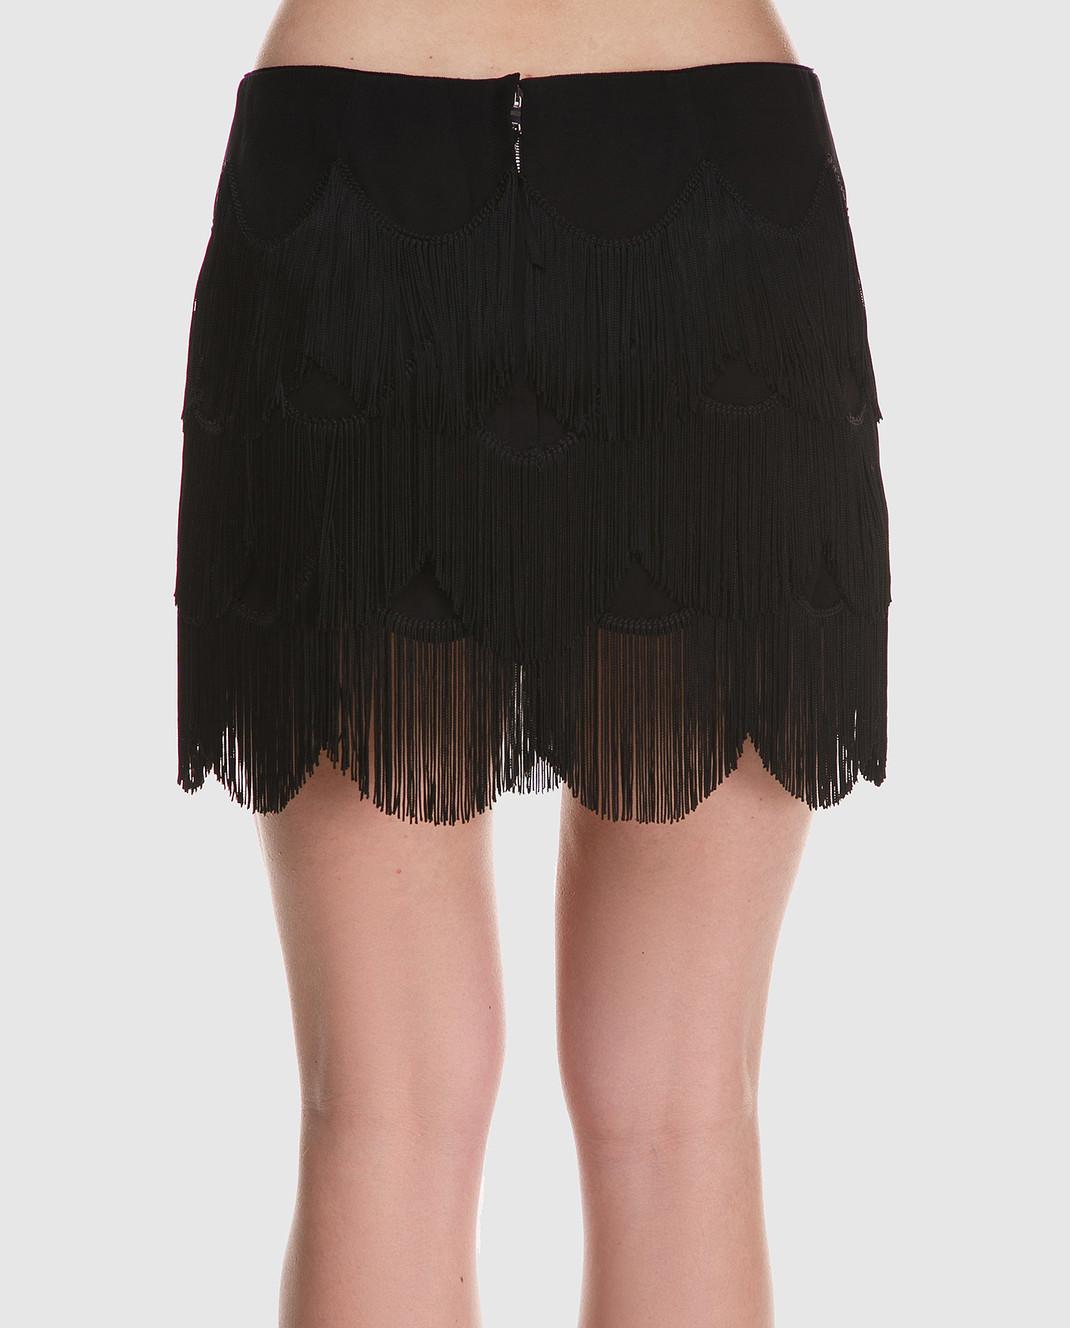 Marc Jacobs Черная юбка с бахромой M4007161 изображение 4